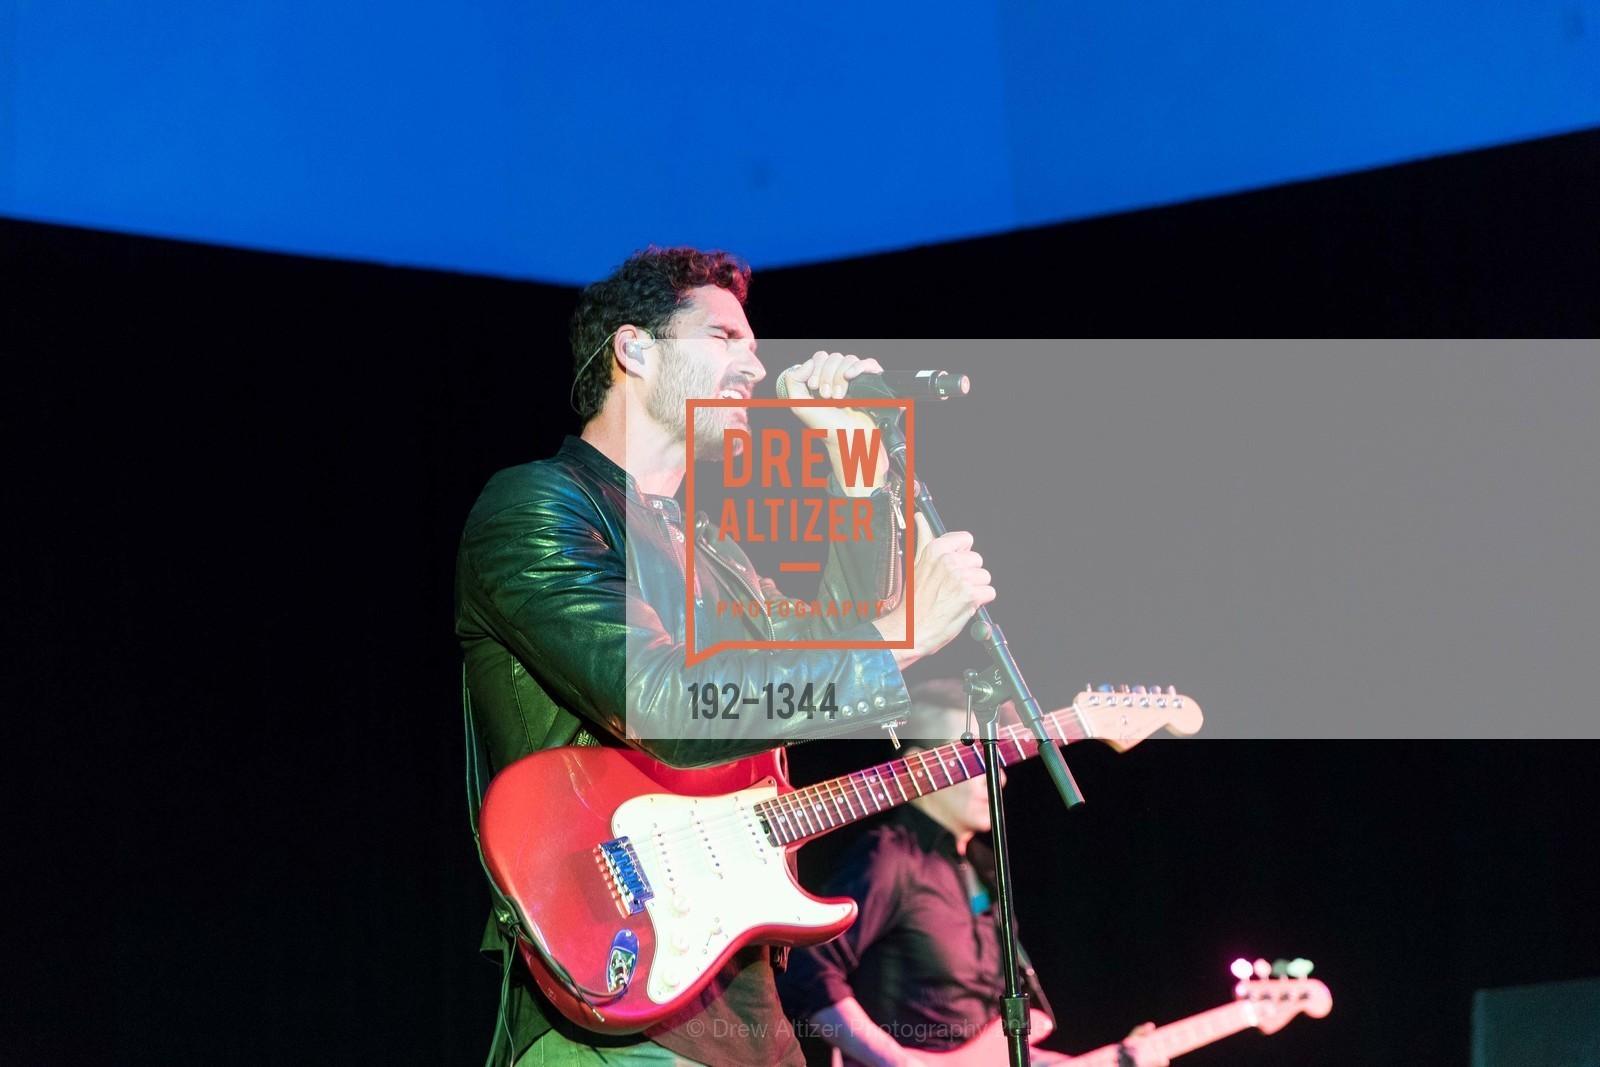 Performance, Photo #192-1344